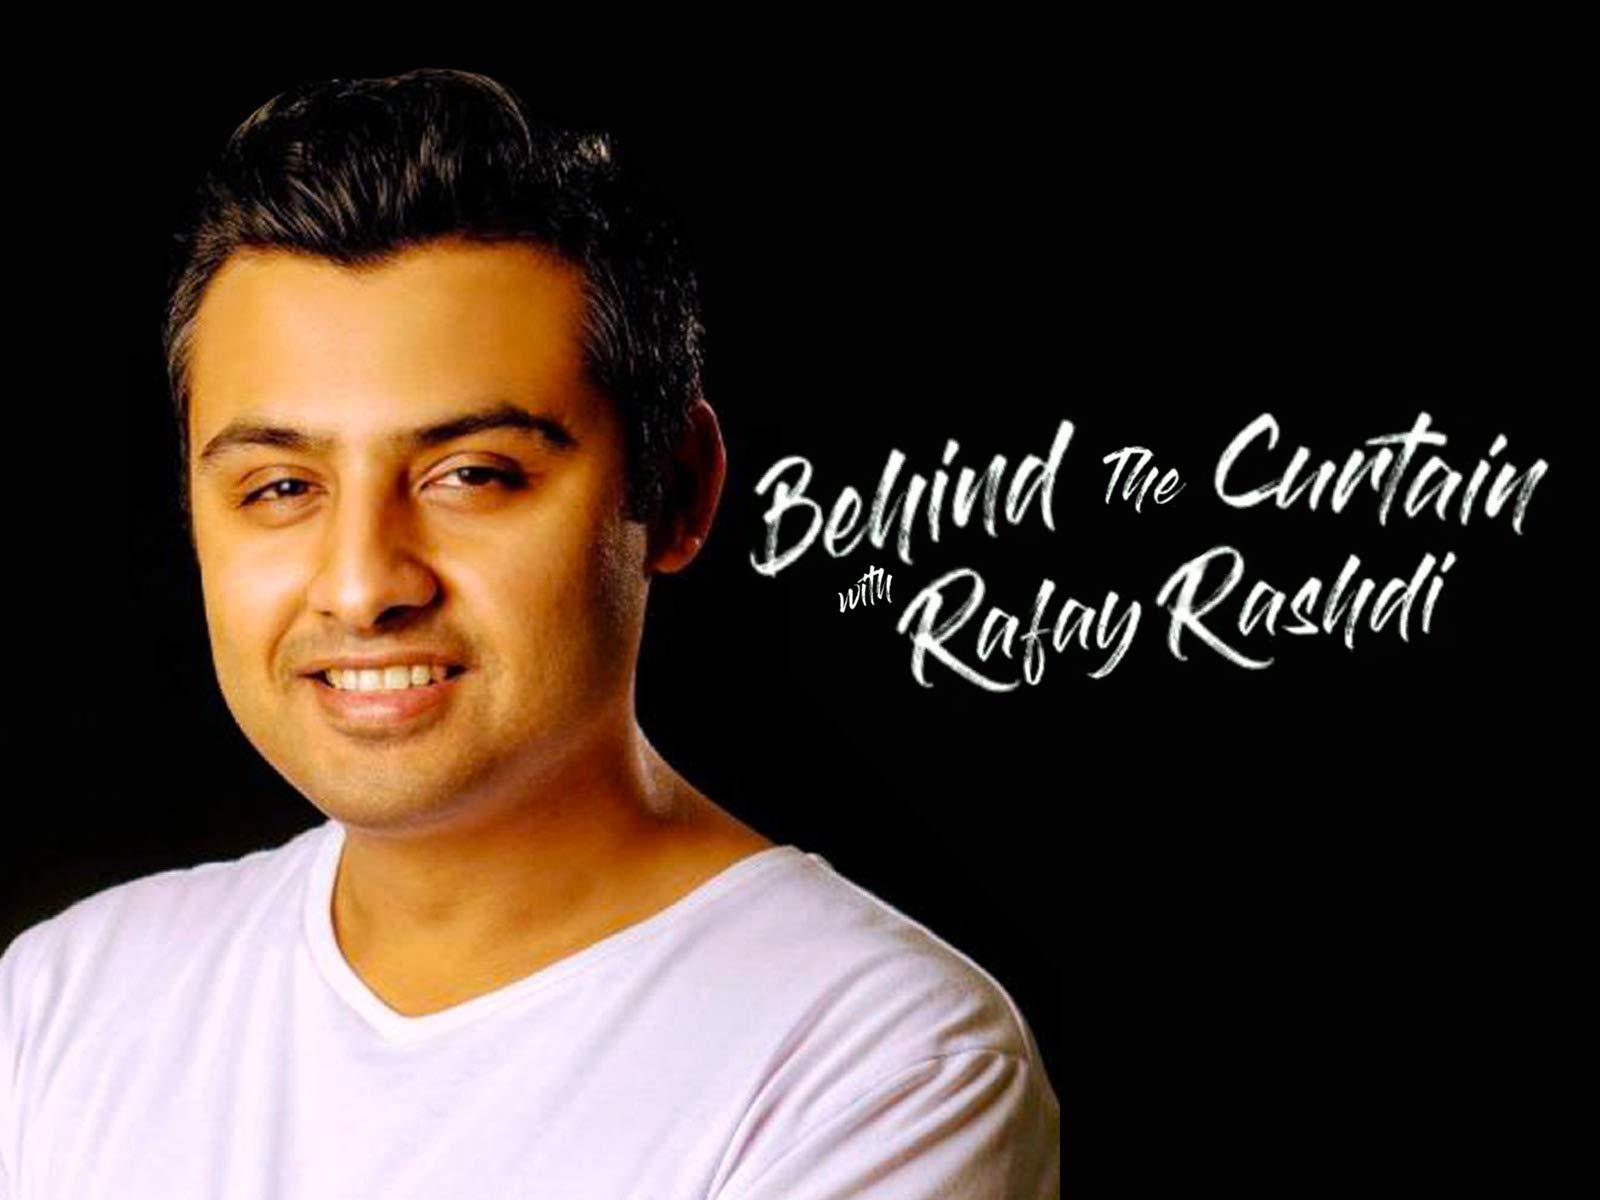 Behind The Curtain With Rafay Rashdi - Season 1